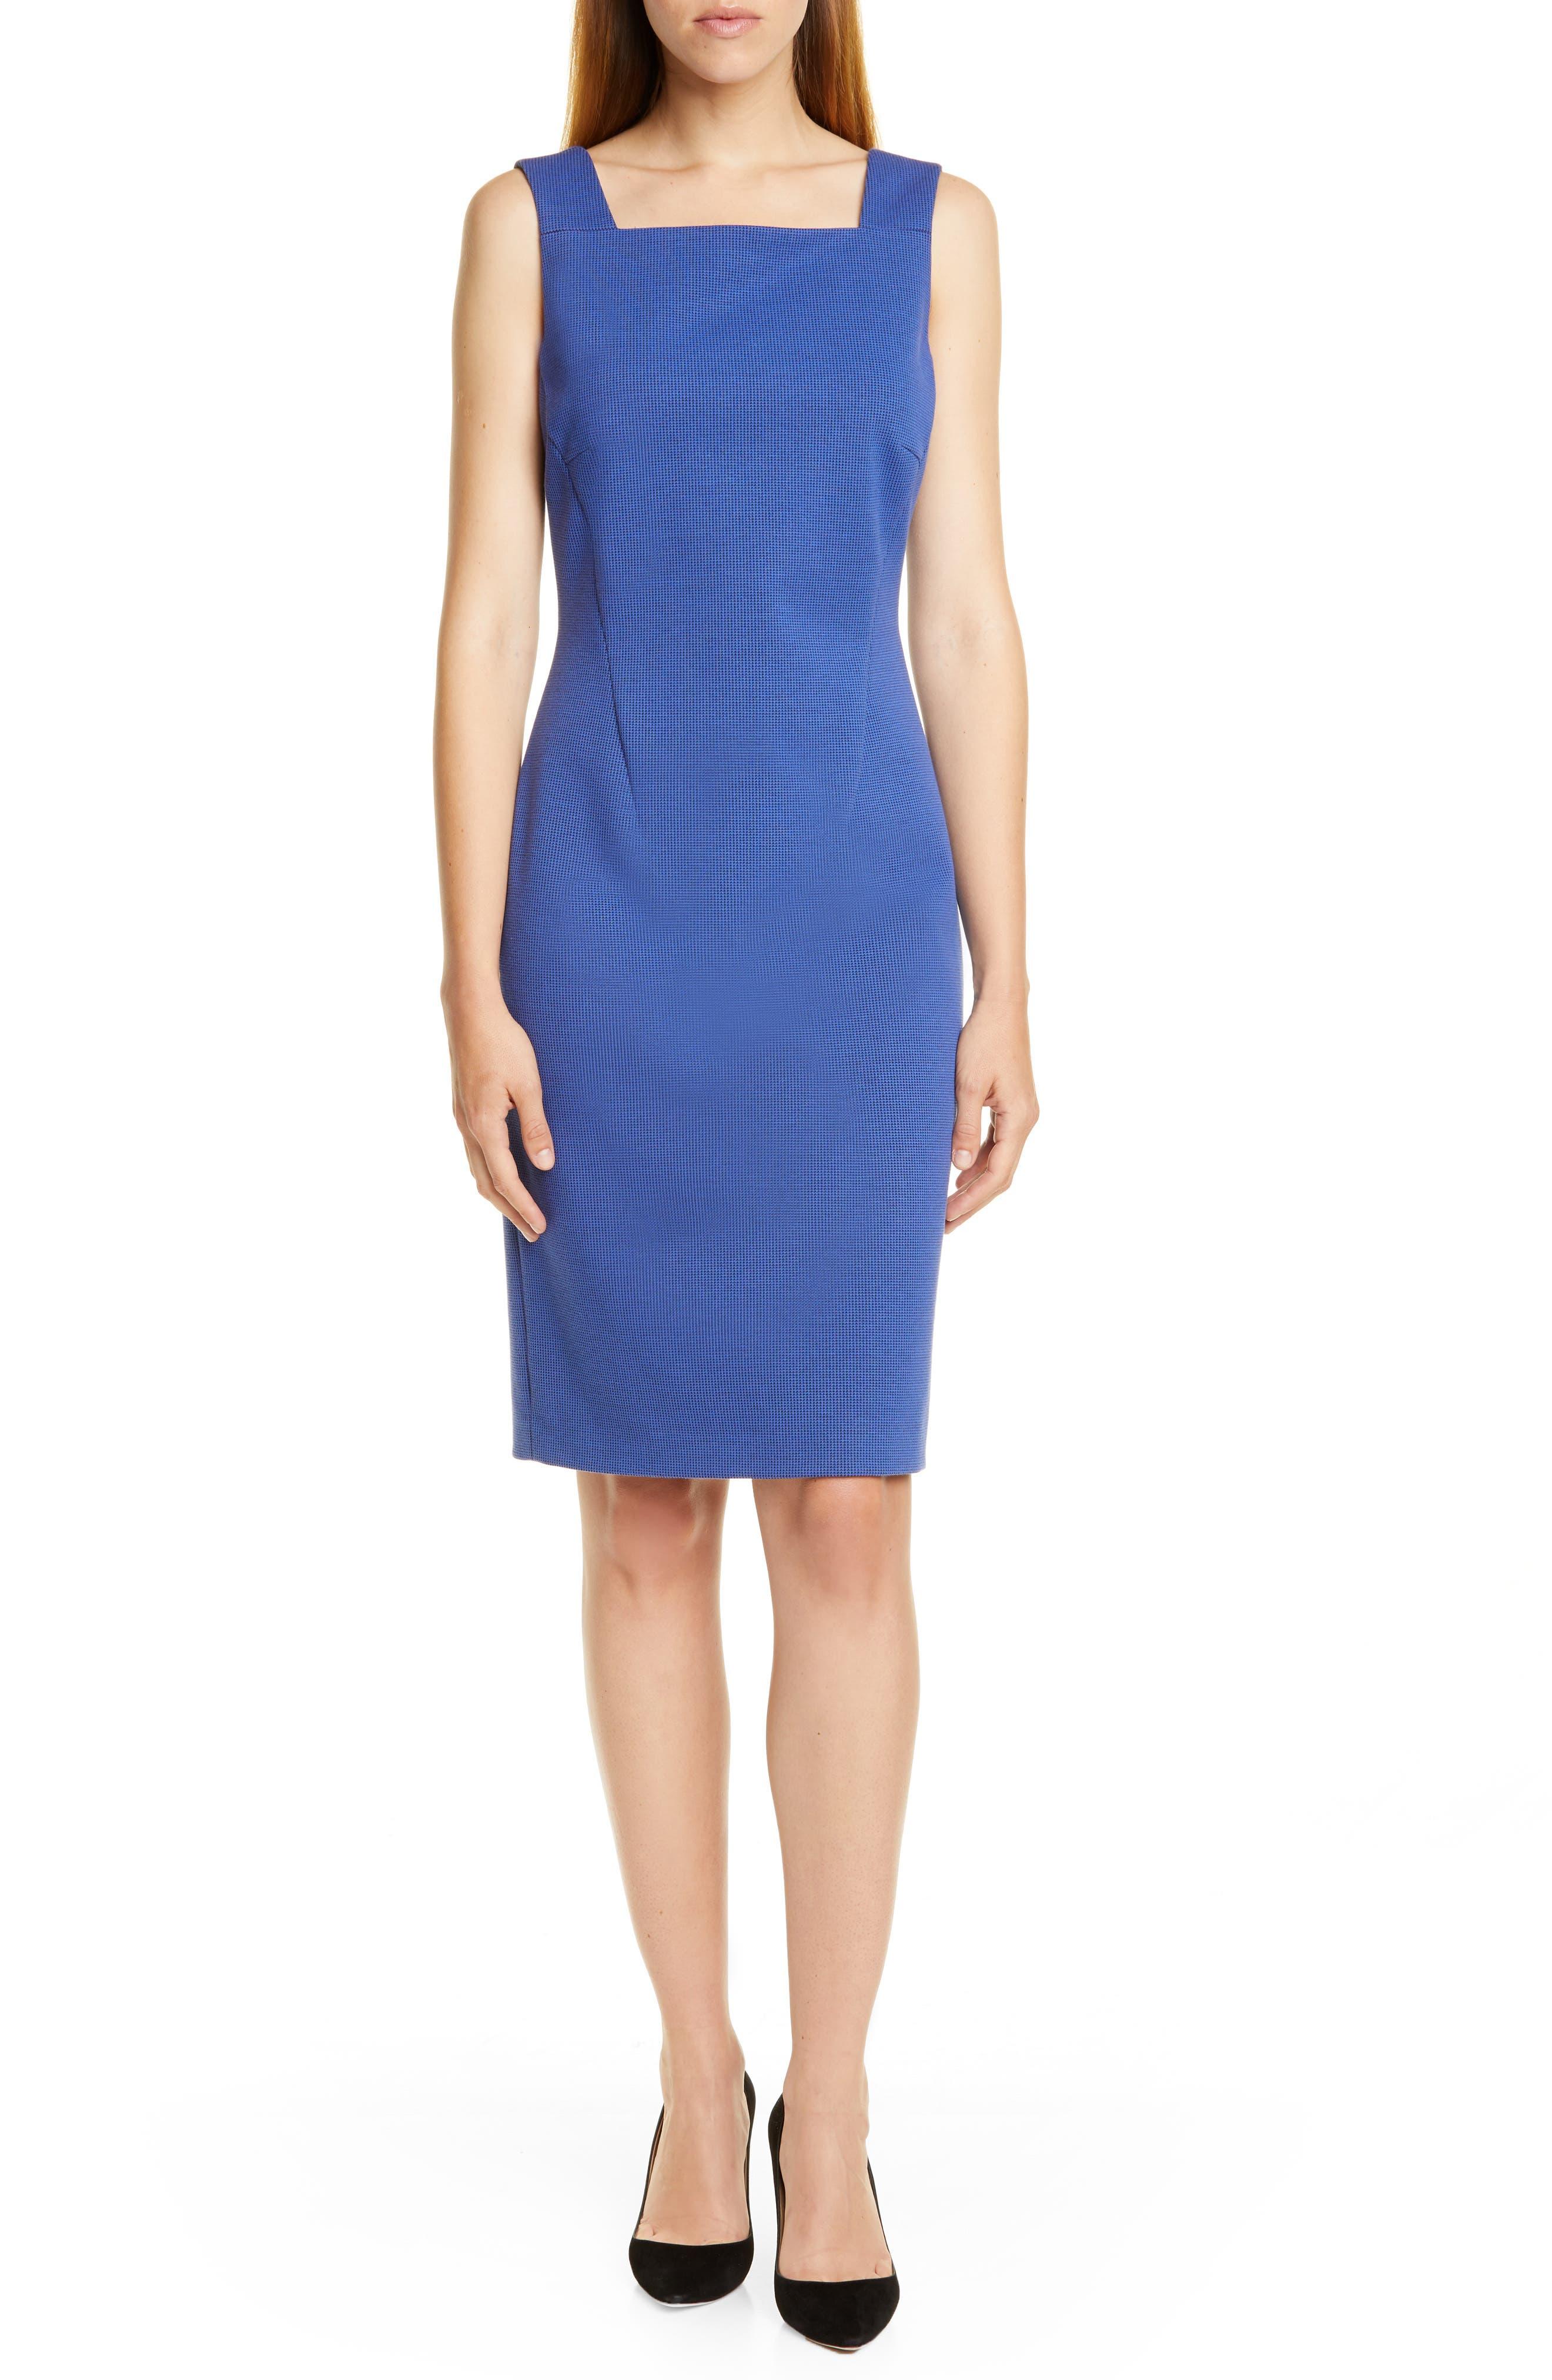 Boss Davenara Square Neck Cotton Blend Sheath Dress, Blue